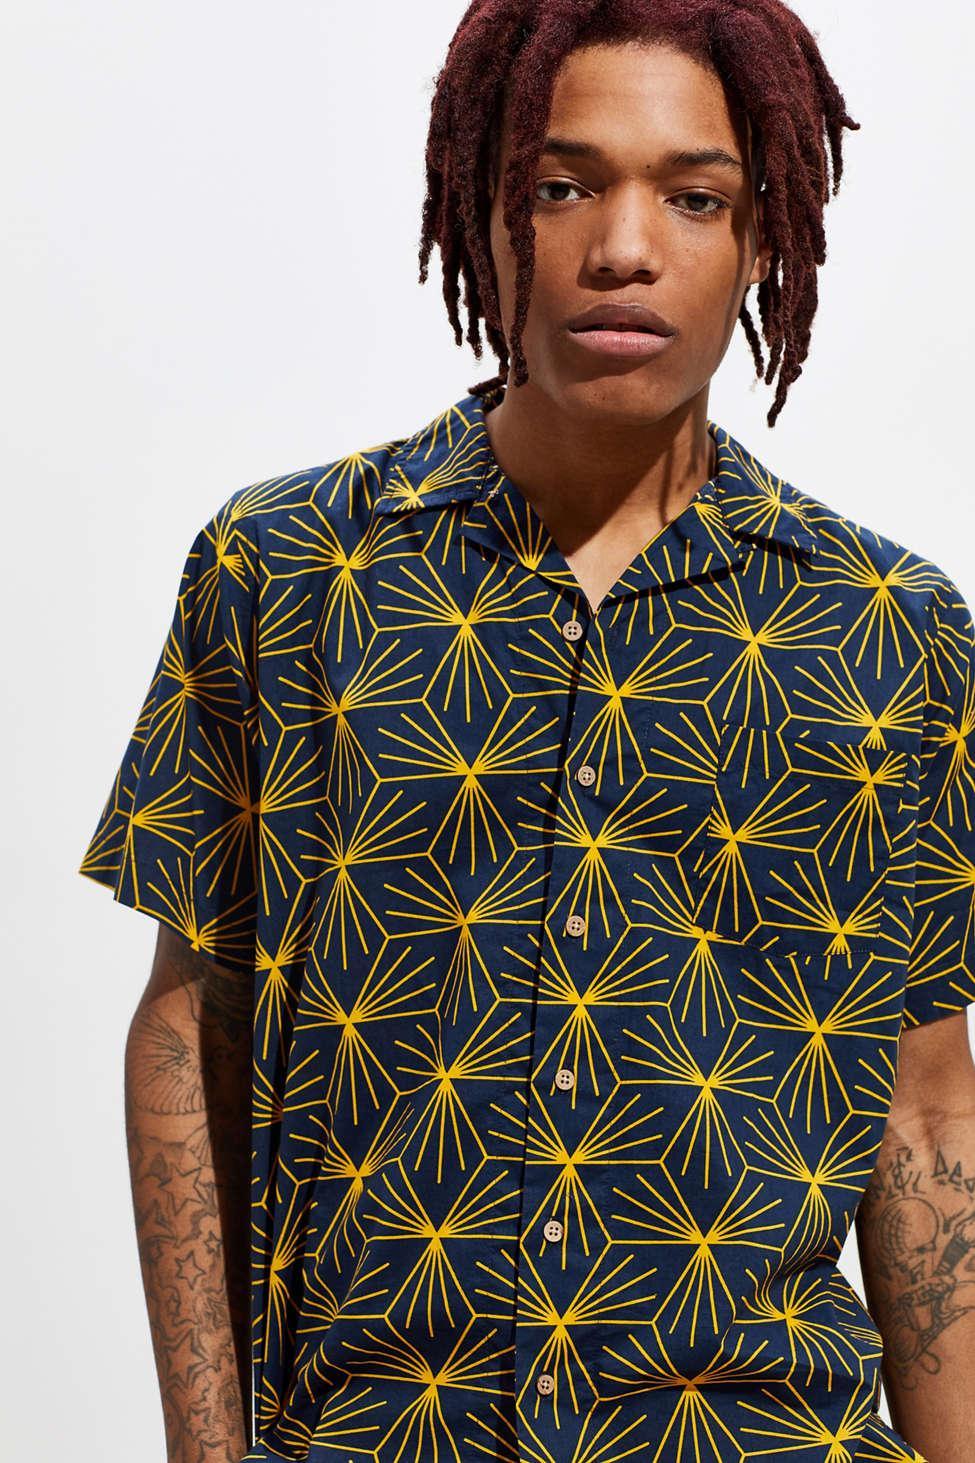 524b620e651e4 Lyst - Ambsn Starburst Short Sleeve Button-down Shirt in Blue for Men